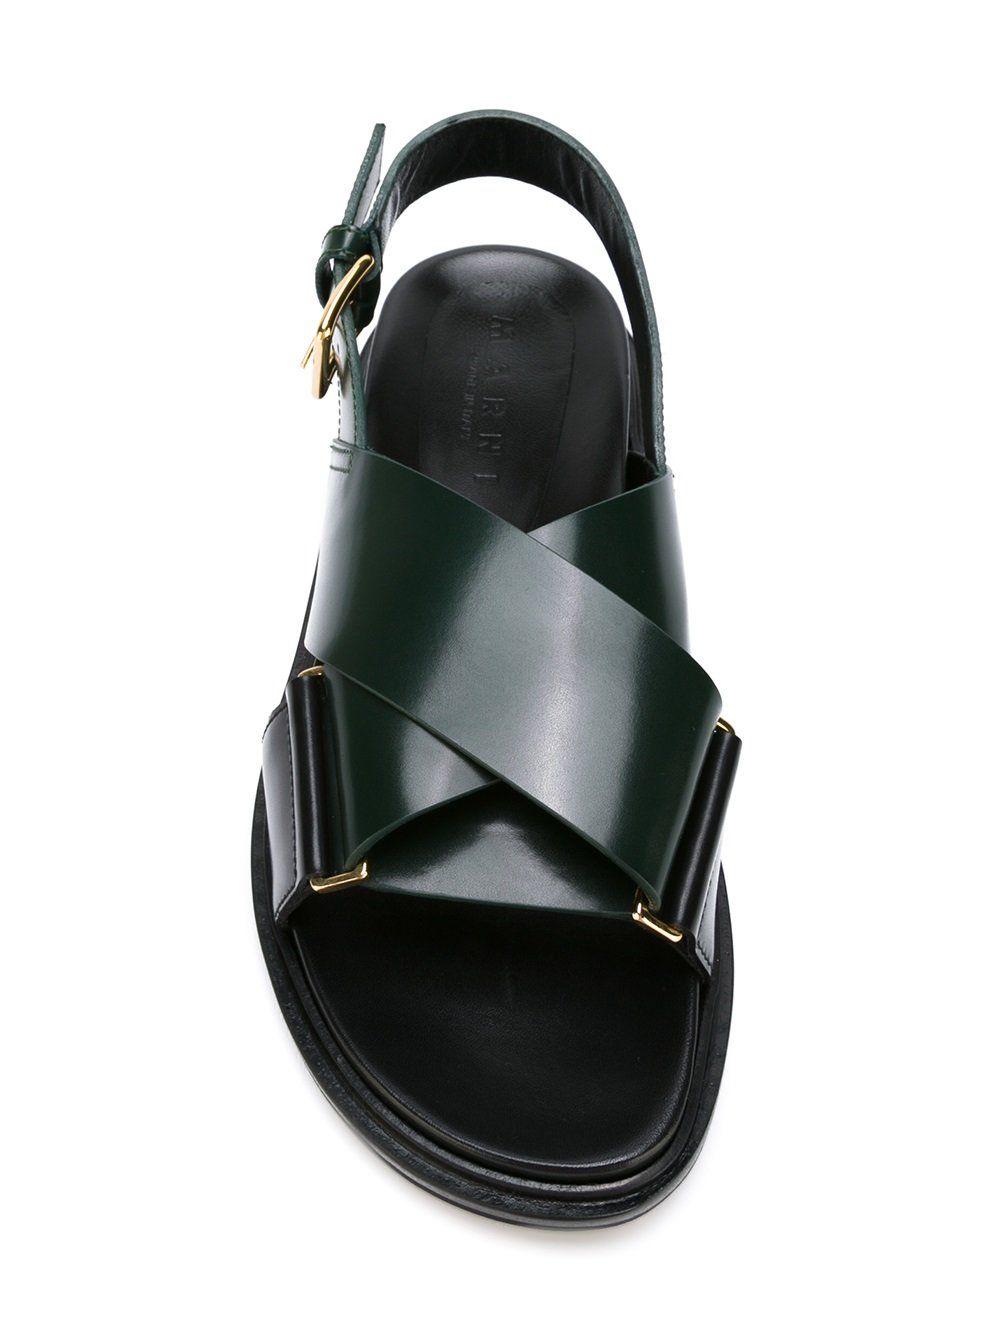 Marni Fussbett sandals | Marni shoes